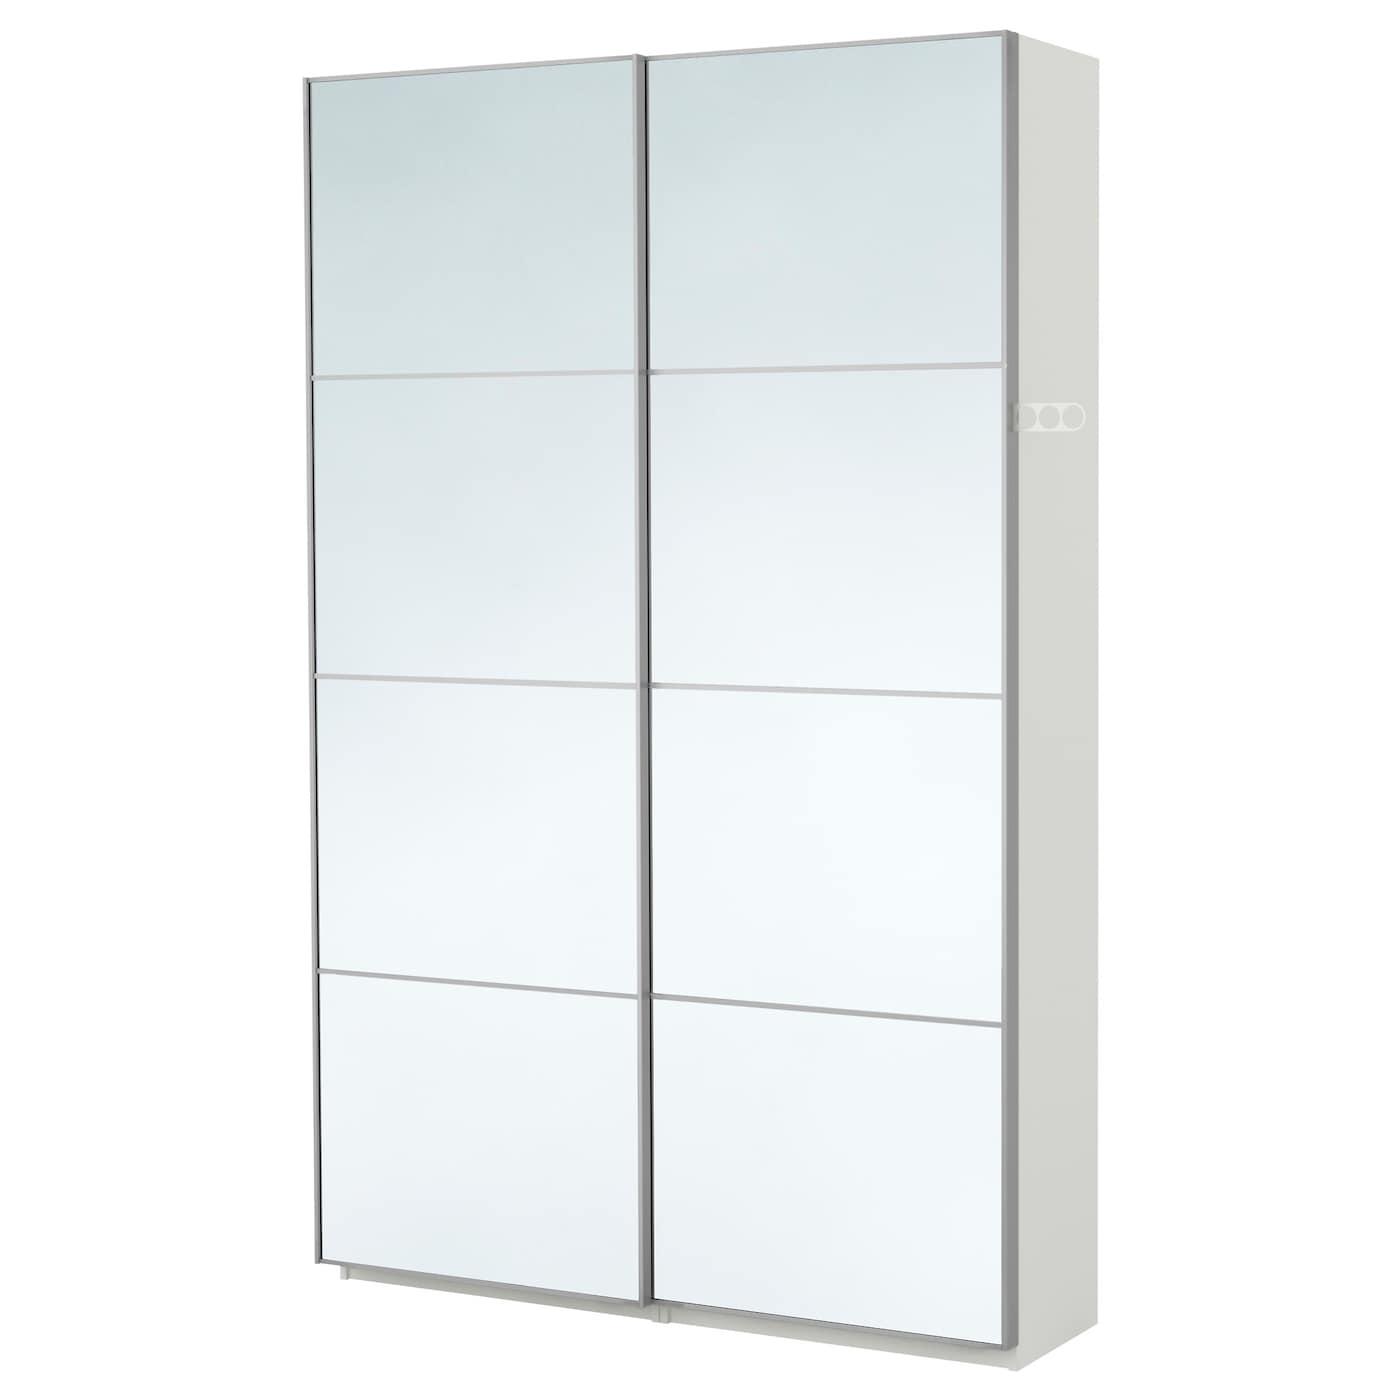 PAX Wardrobe Whiteauli Mirror Glass Xx Cm IKEA - Ikea wardrobe